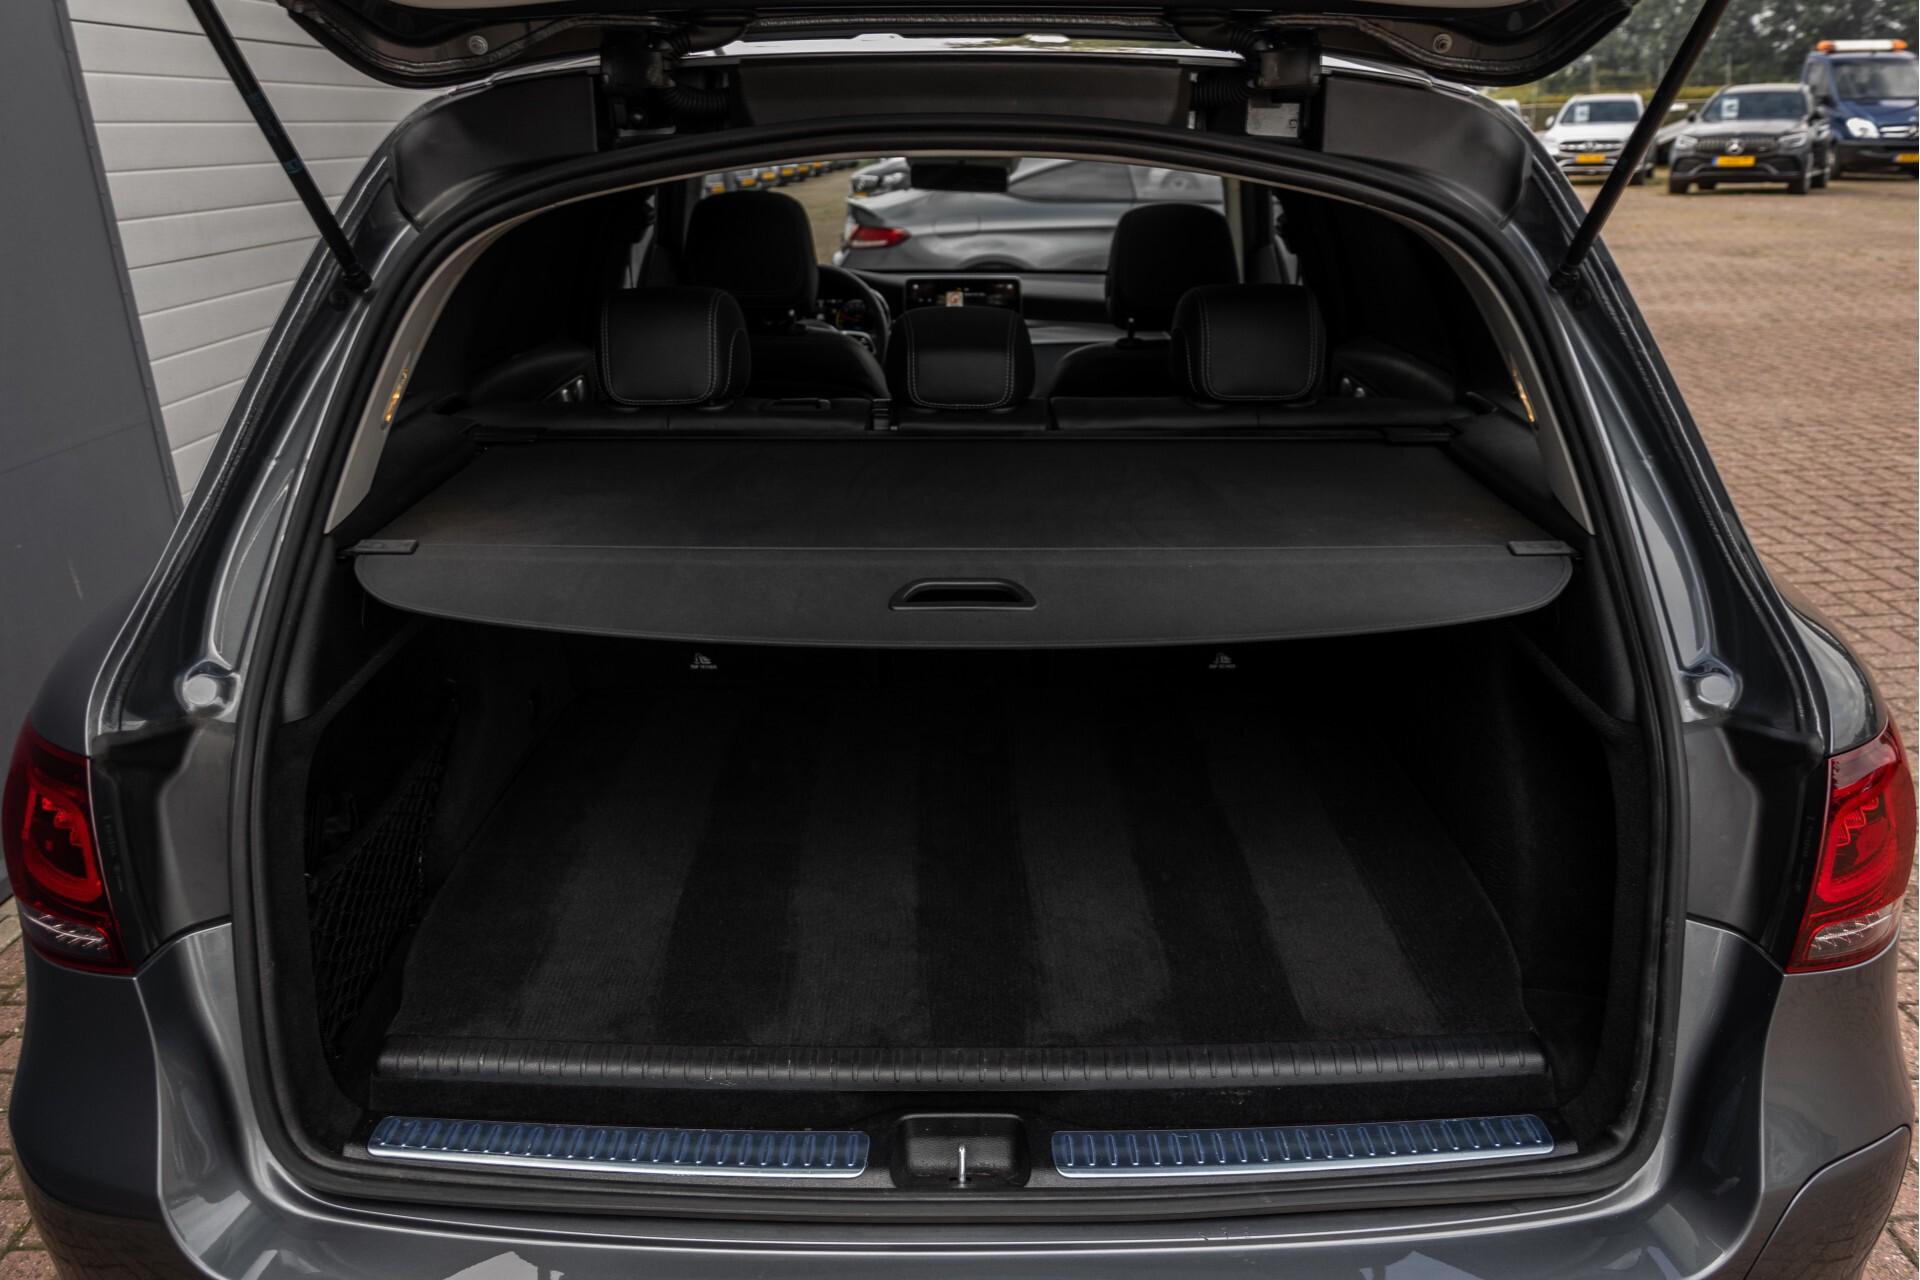 Mercedes-Benz GLC 300e 4-M Luchtvering/Panorama/Multicontourstoelen/Rij-assistentie/Standkachel Aut9 Foto 58